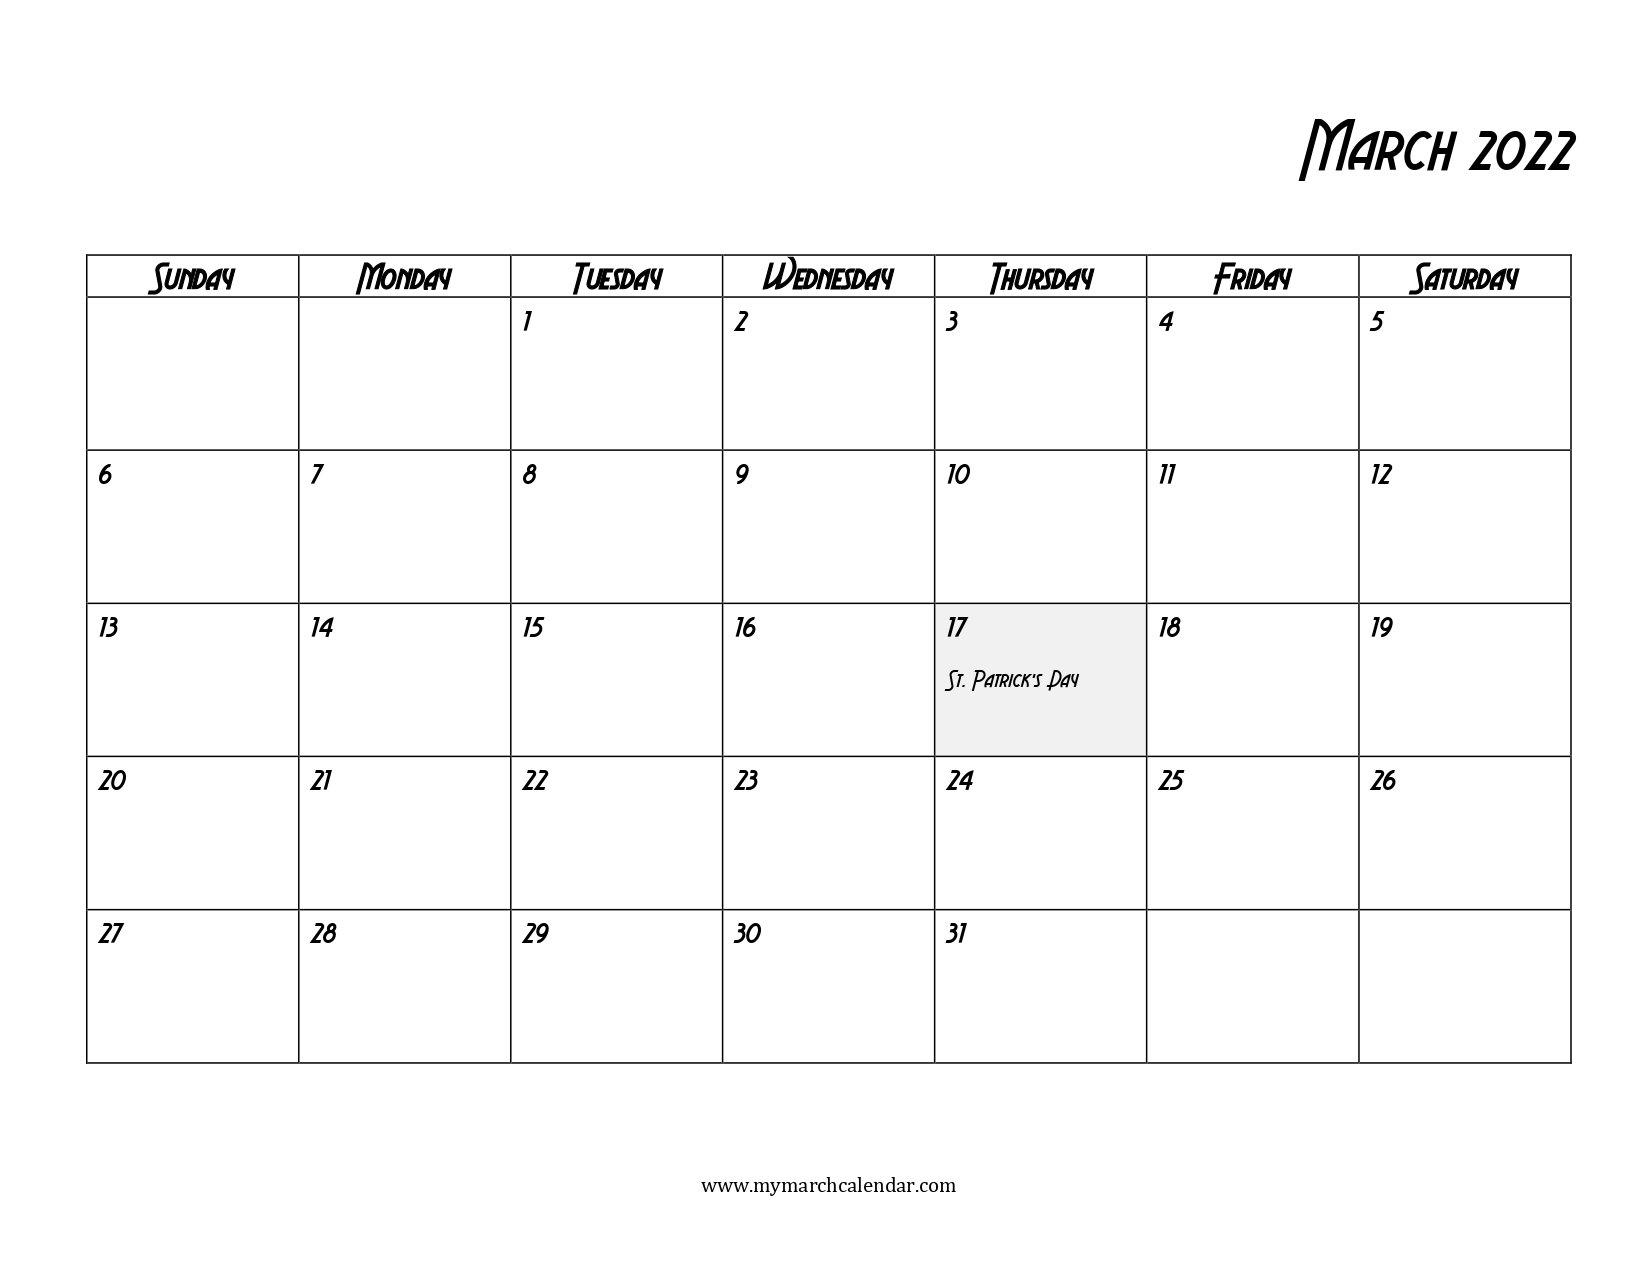 30+ March 2022 Calendar, March 2022 Blank Calendar pertaining to March 2022 Calendar Printable Photo